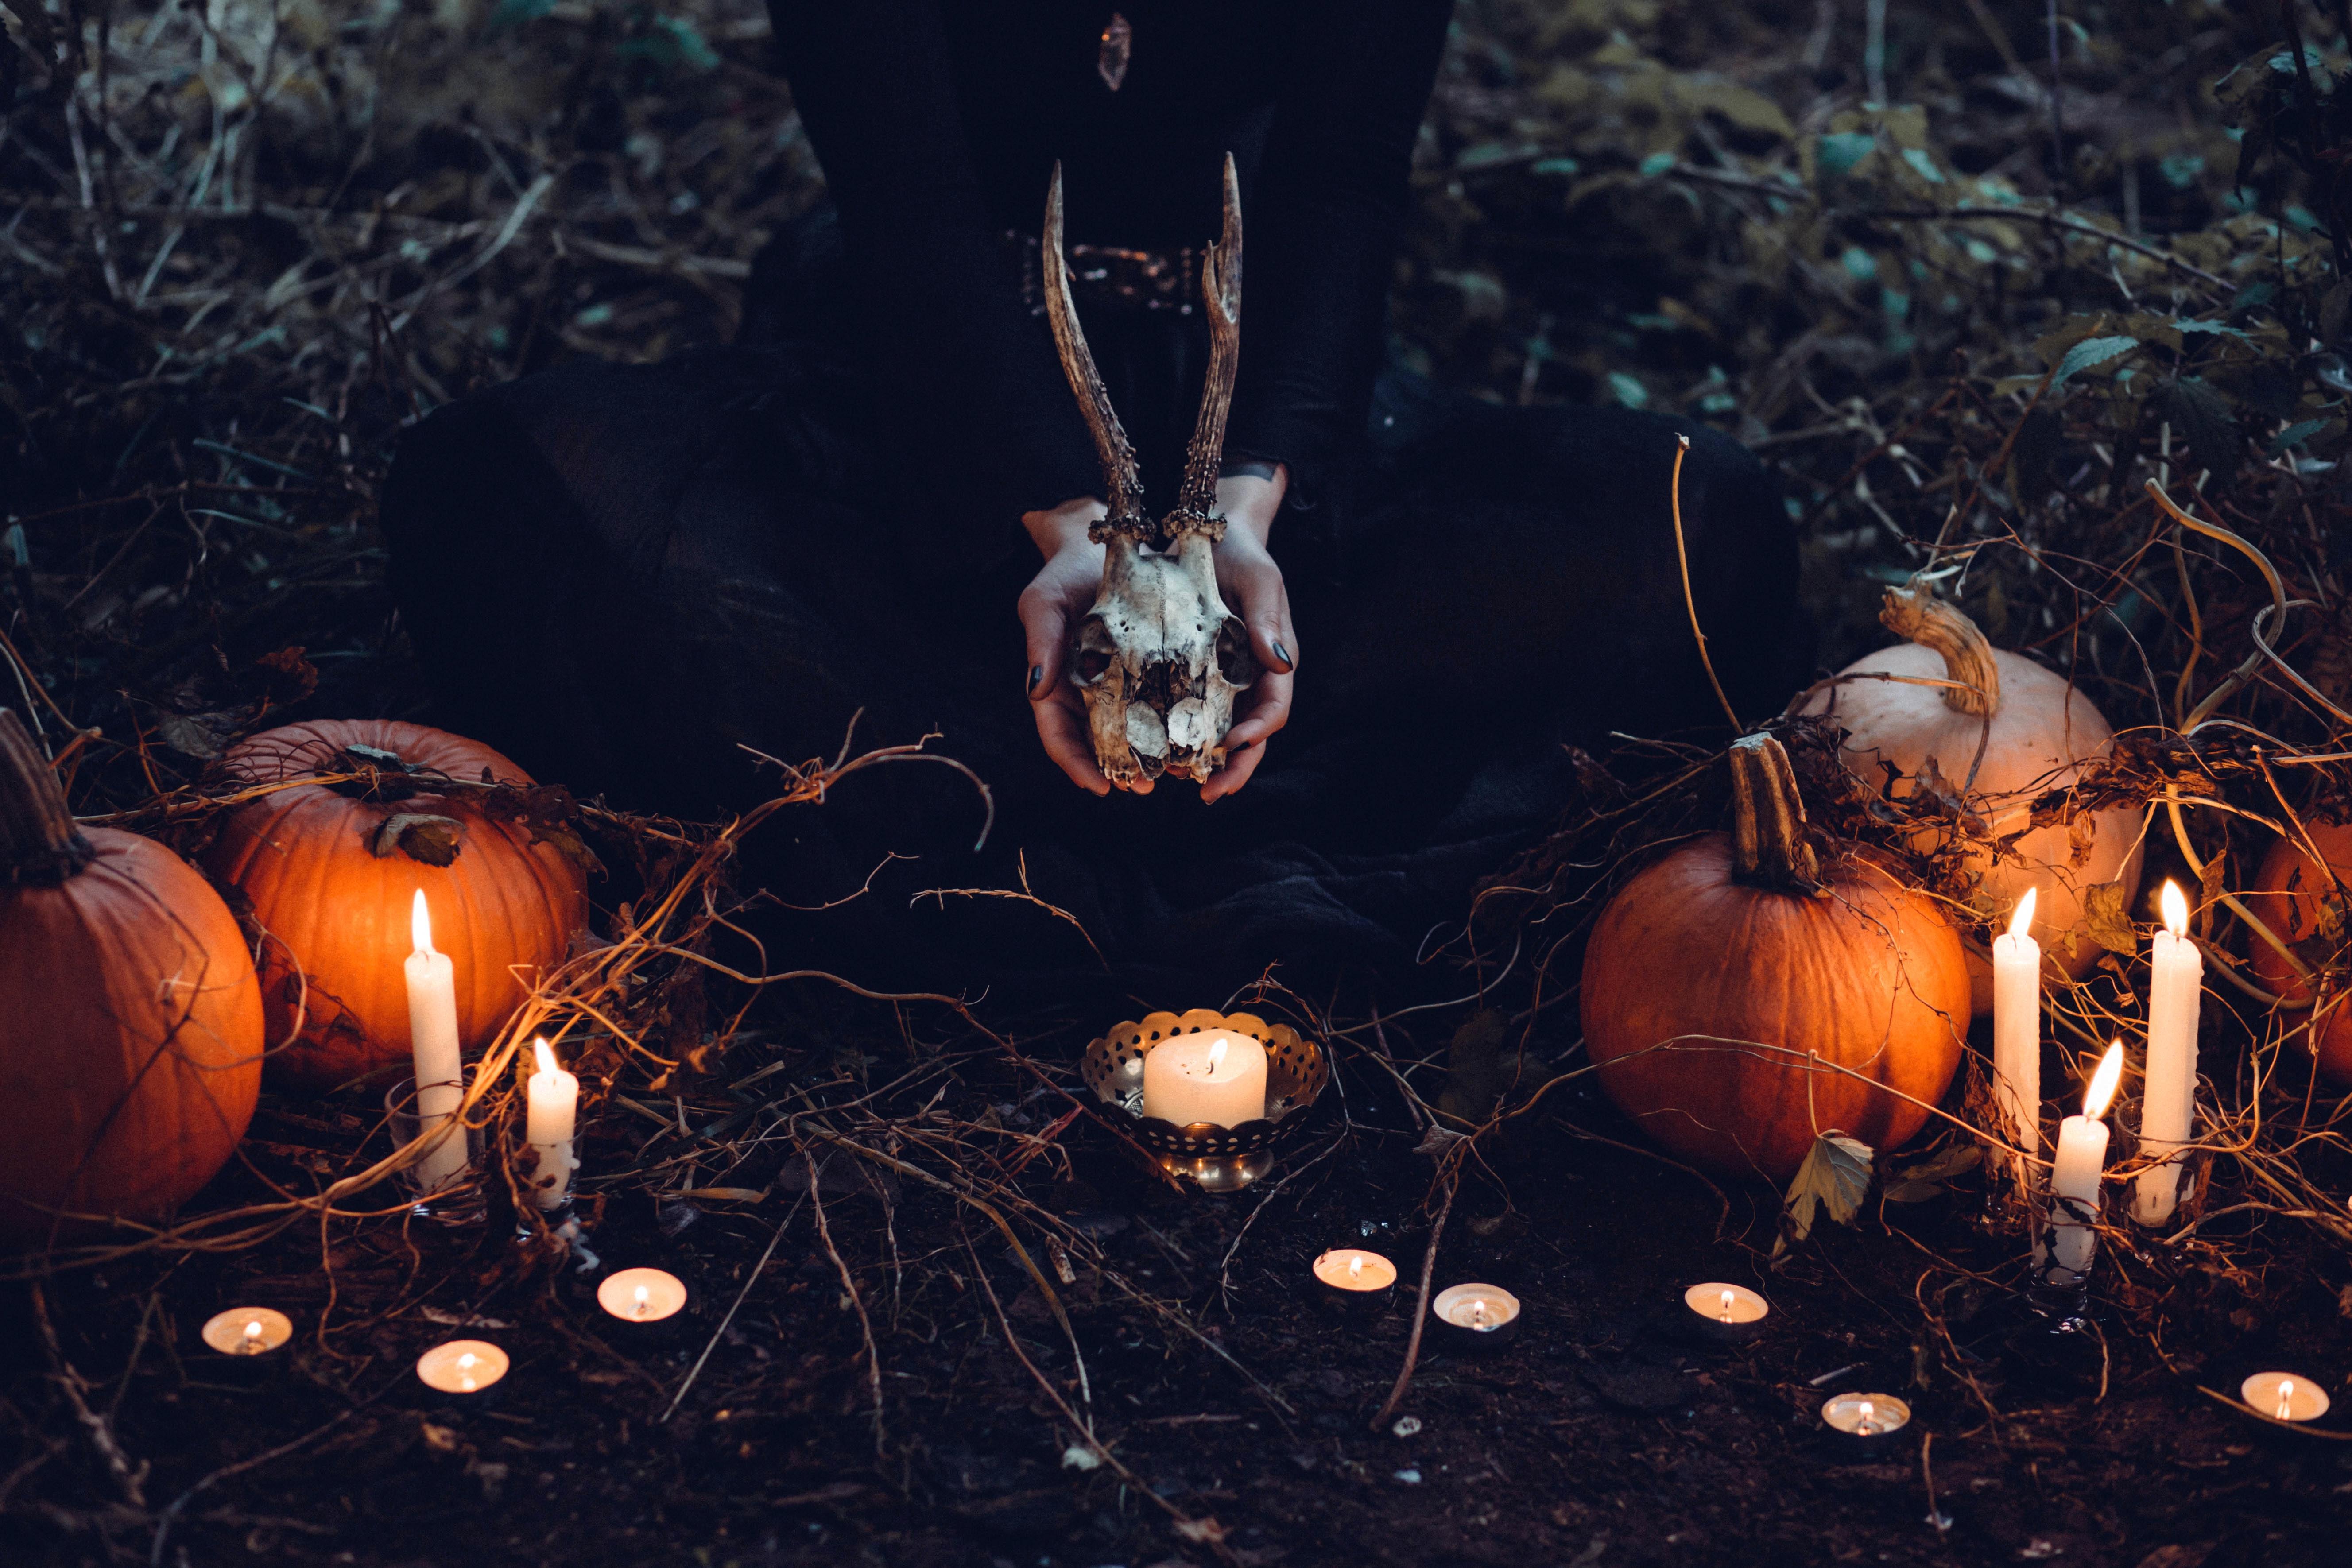 brown-pumpkin halloween decor and gray skull at grass field